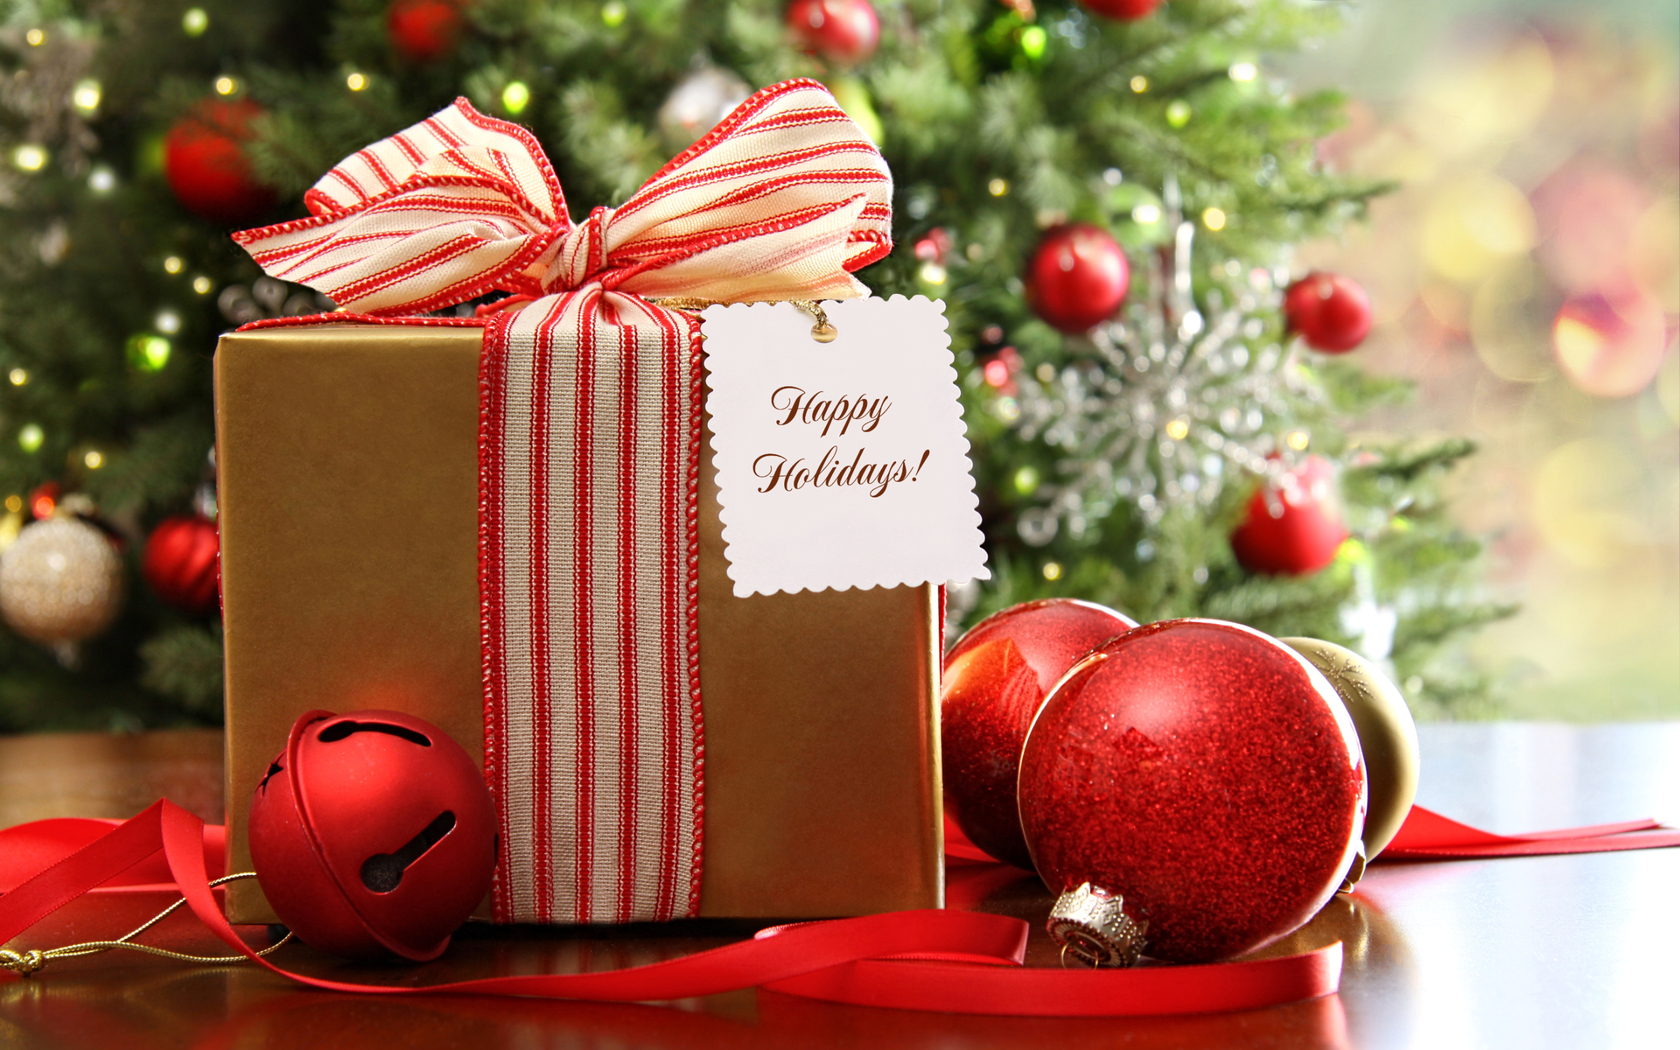 Christmas Present.Christmas Present Image 123414 4563174 A Caring Nanny